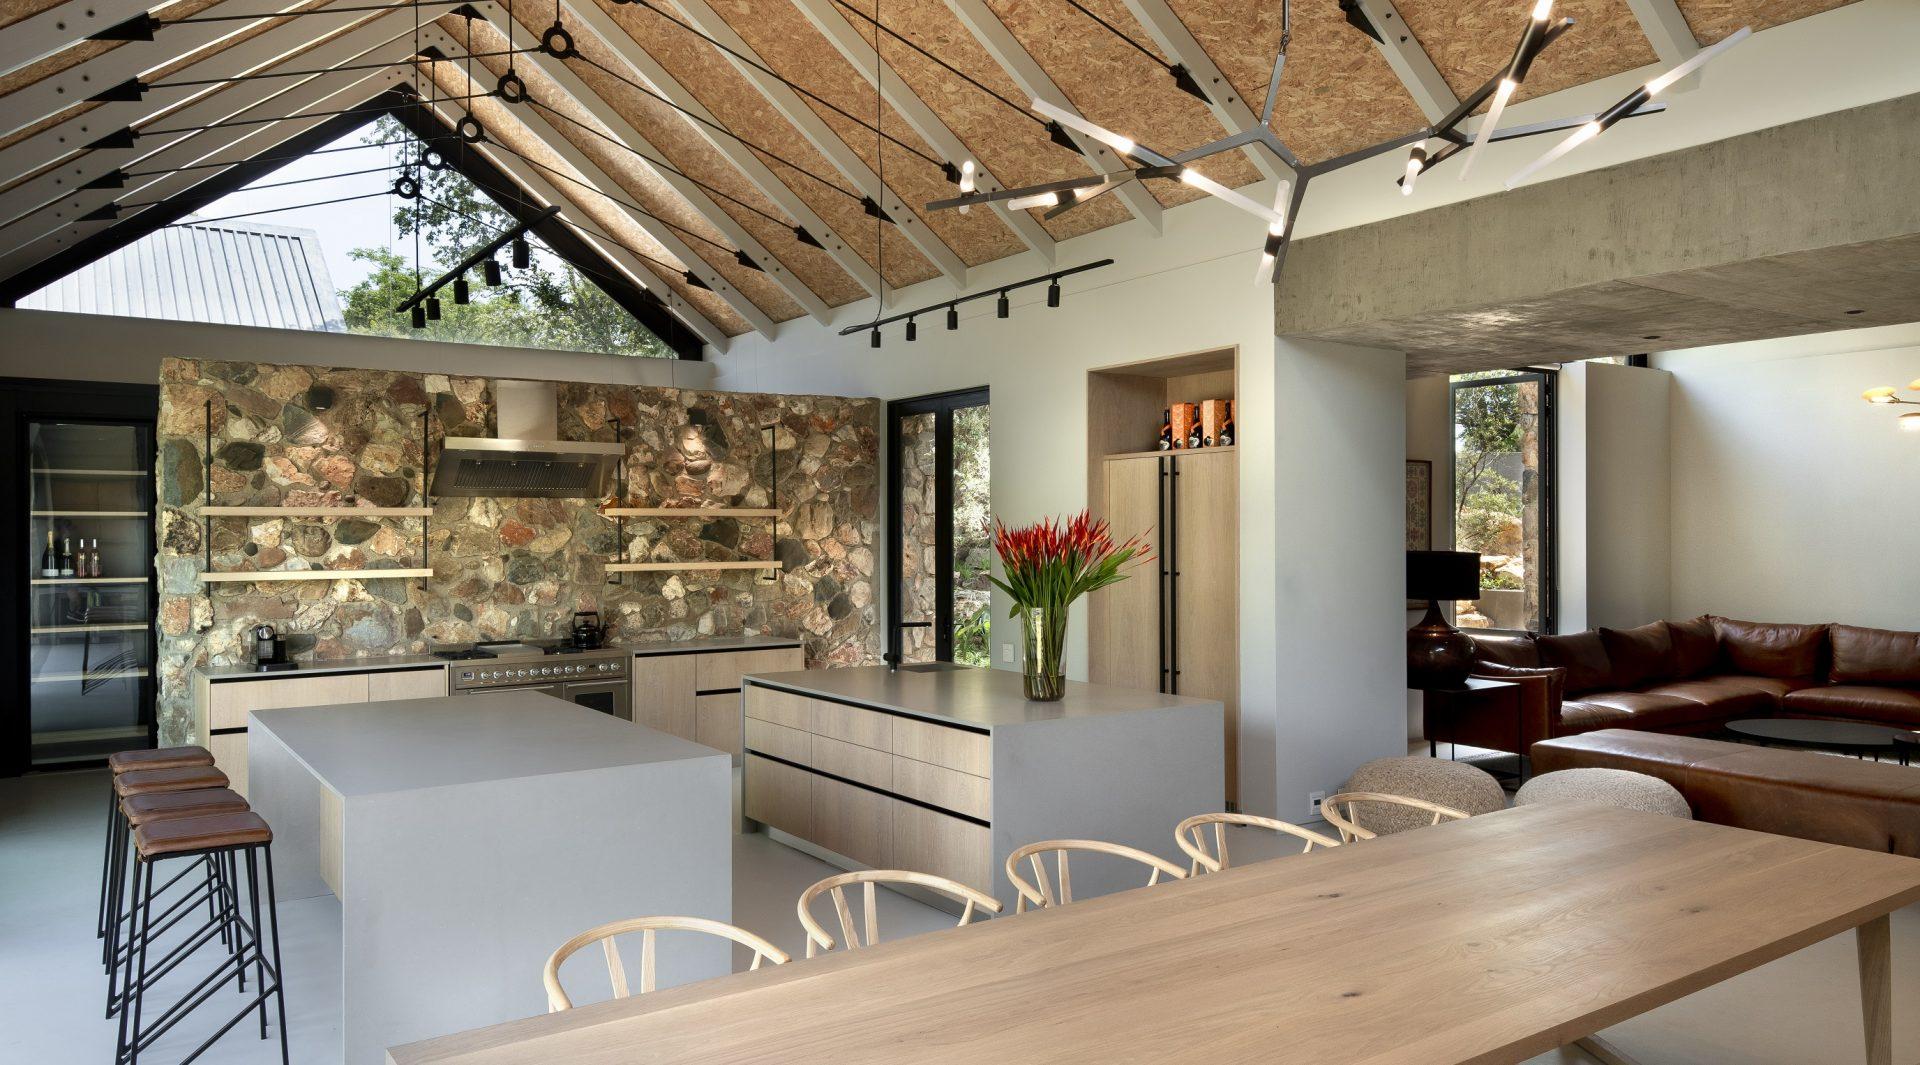 JVR Architects & Interiors